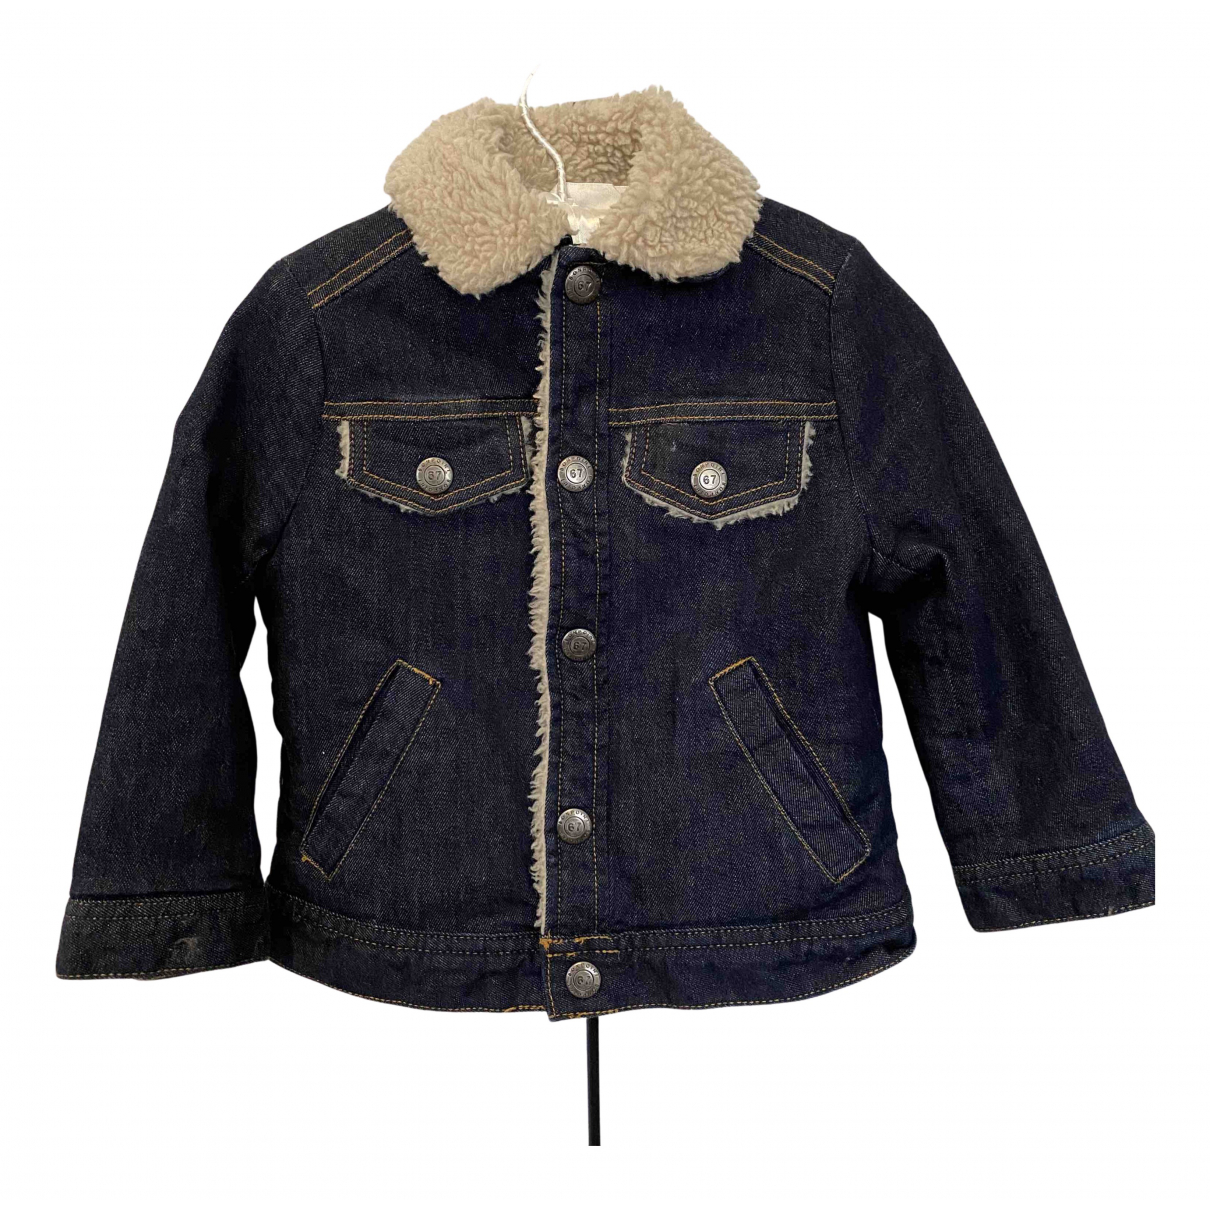 Bonpoint \N Jacke, Maentel in  Marine Denim - Jeans